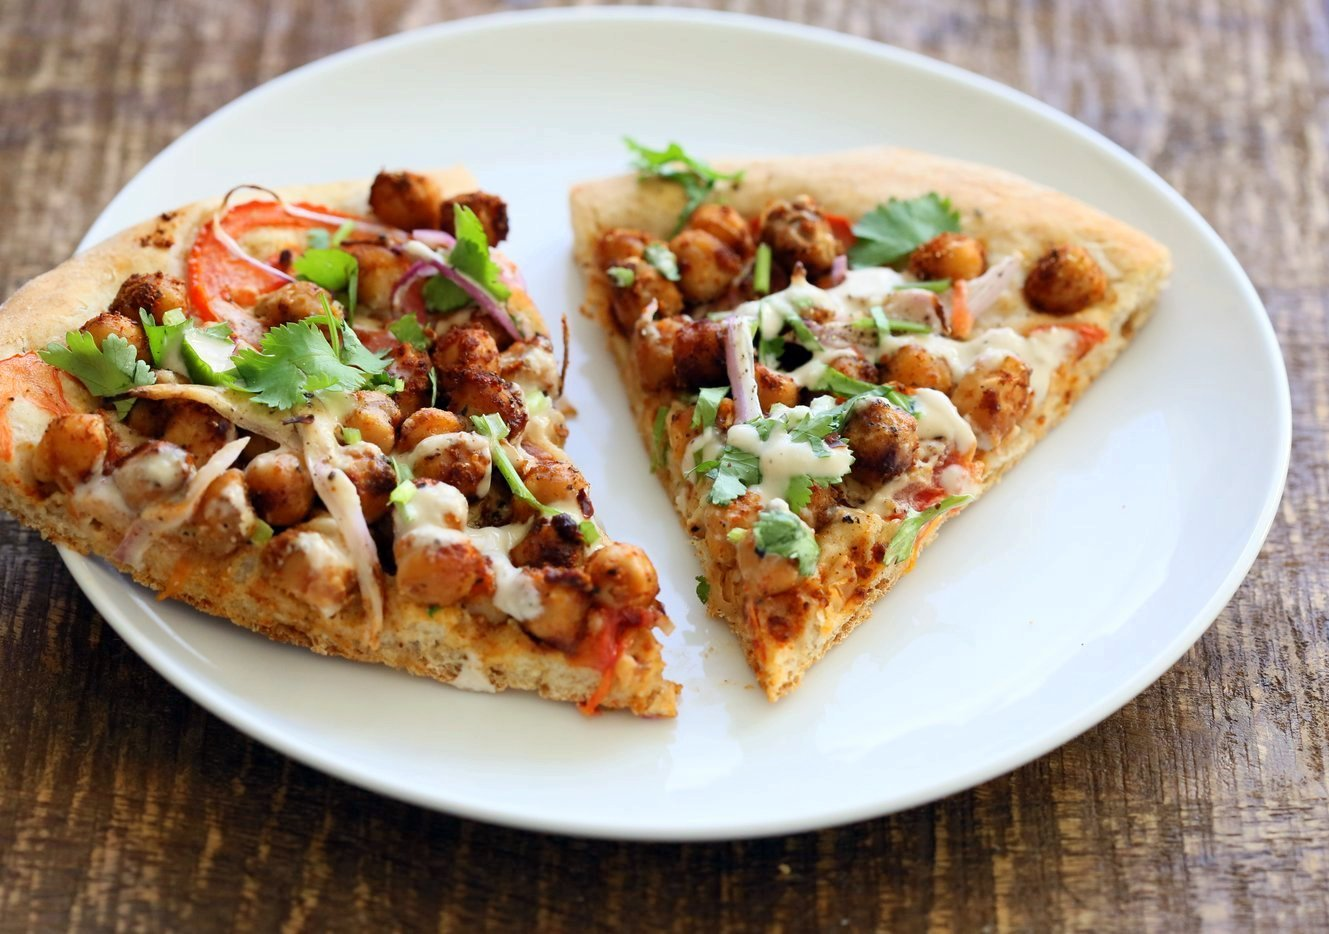 Ethiopian Berbere Chickpea Pizza with Tahini Garlic Dressing. Amazingly flavorful pizza. Dress with tahini dressing, vegan ranch or other creamy dressing. Vegan Soyfree Nut-free Recipe. Gluten-free Crust option.   VeganRicha.com